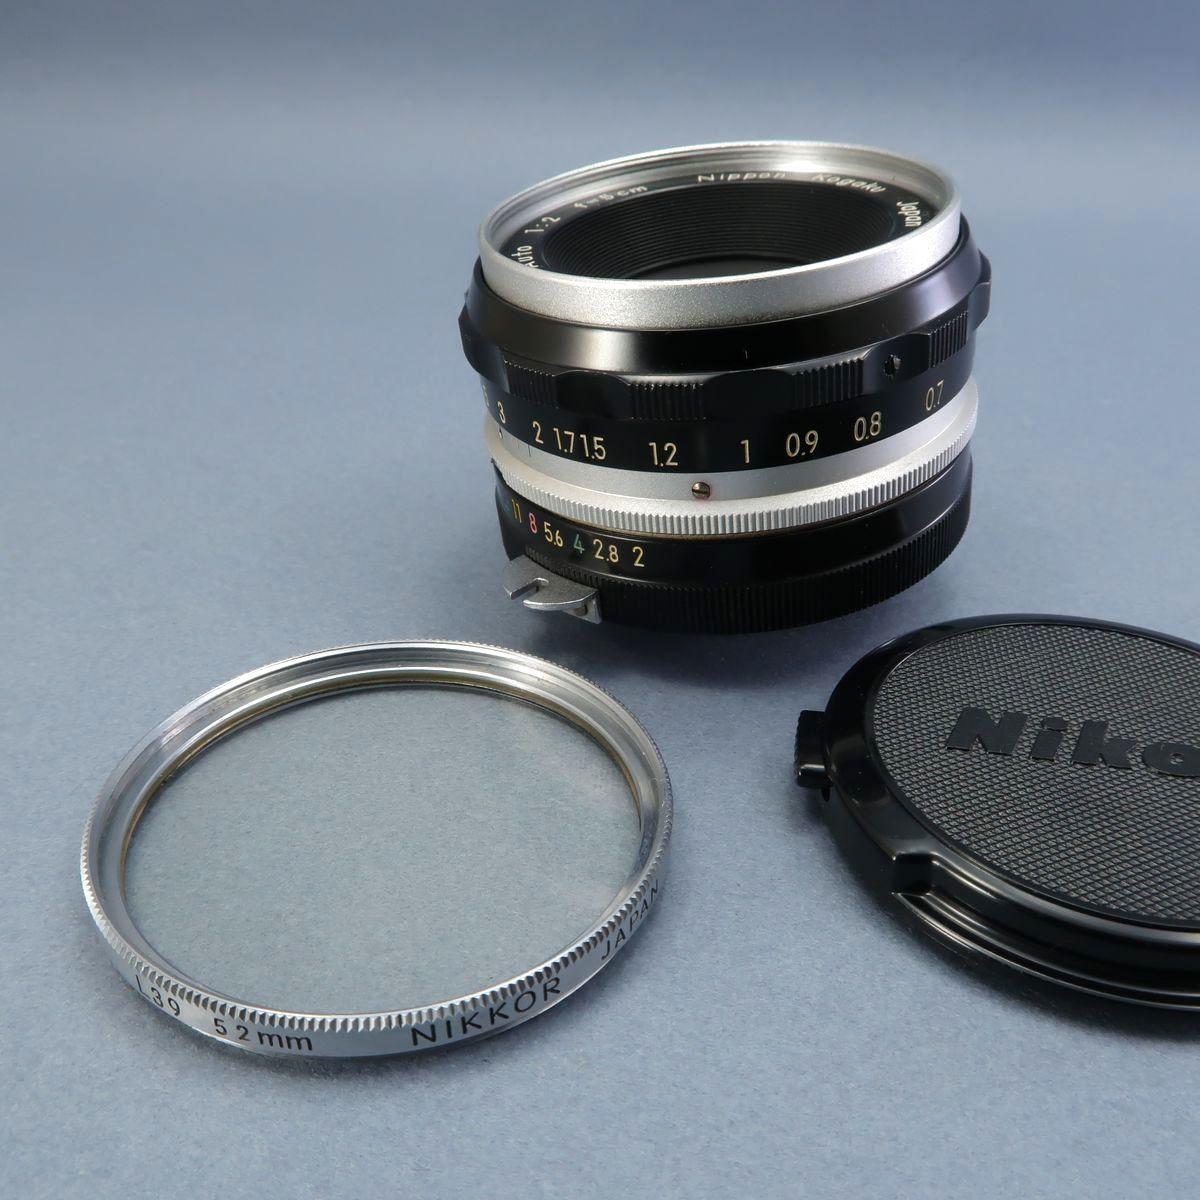 ★Nikon F フィルムカメラ 本体 レンズ Nikkor-Auto 105mm F 2.5 28mm F 3.5 NIKKOR-H Auto 1:3.5 f=2.8cm FTN 付属多数 ジャンク_画像9